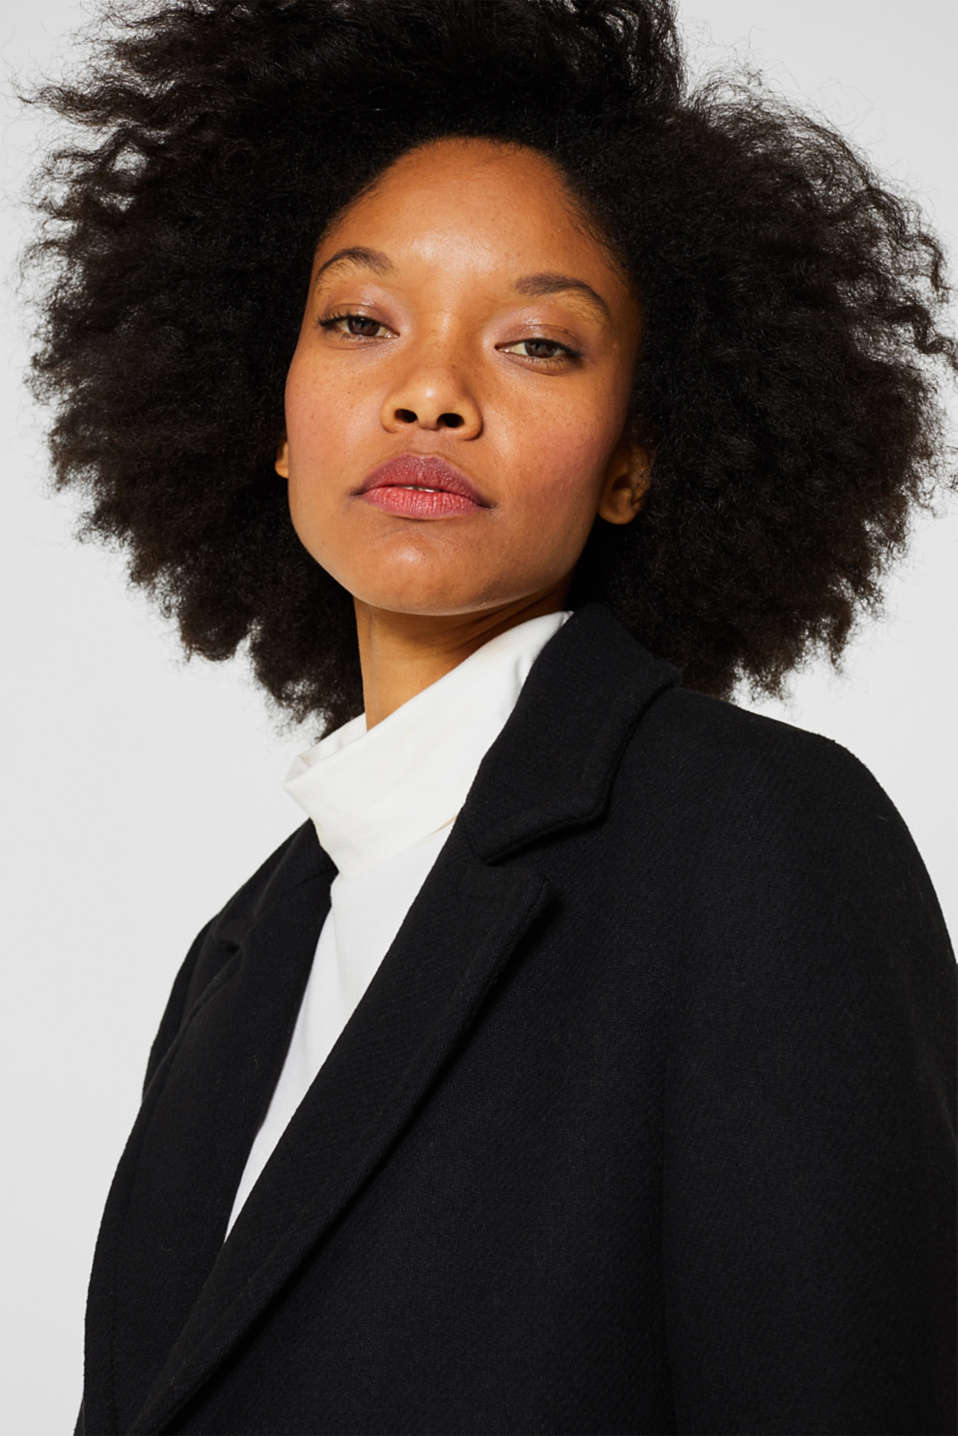 With wool: blazer coat, BLACK, detail image number 5